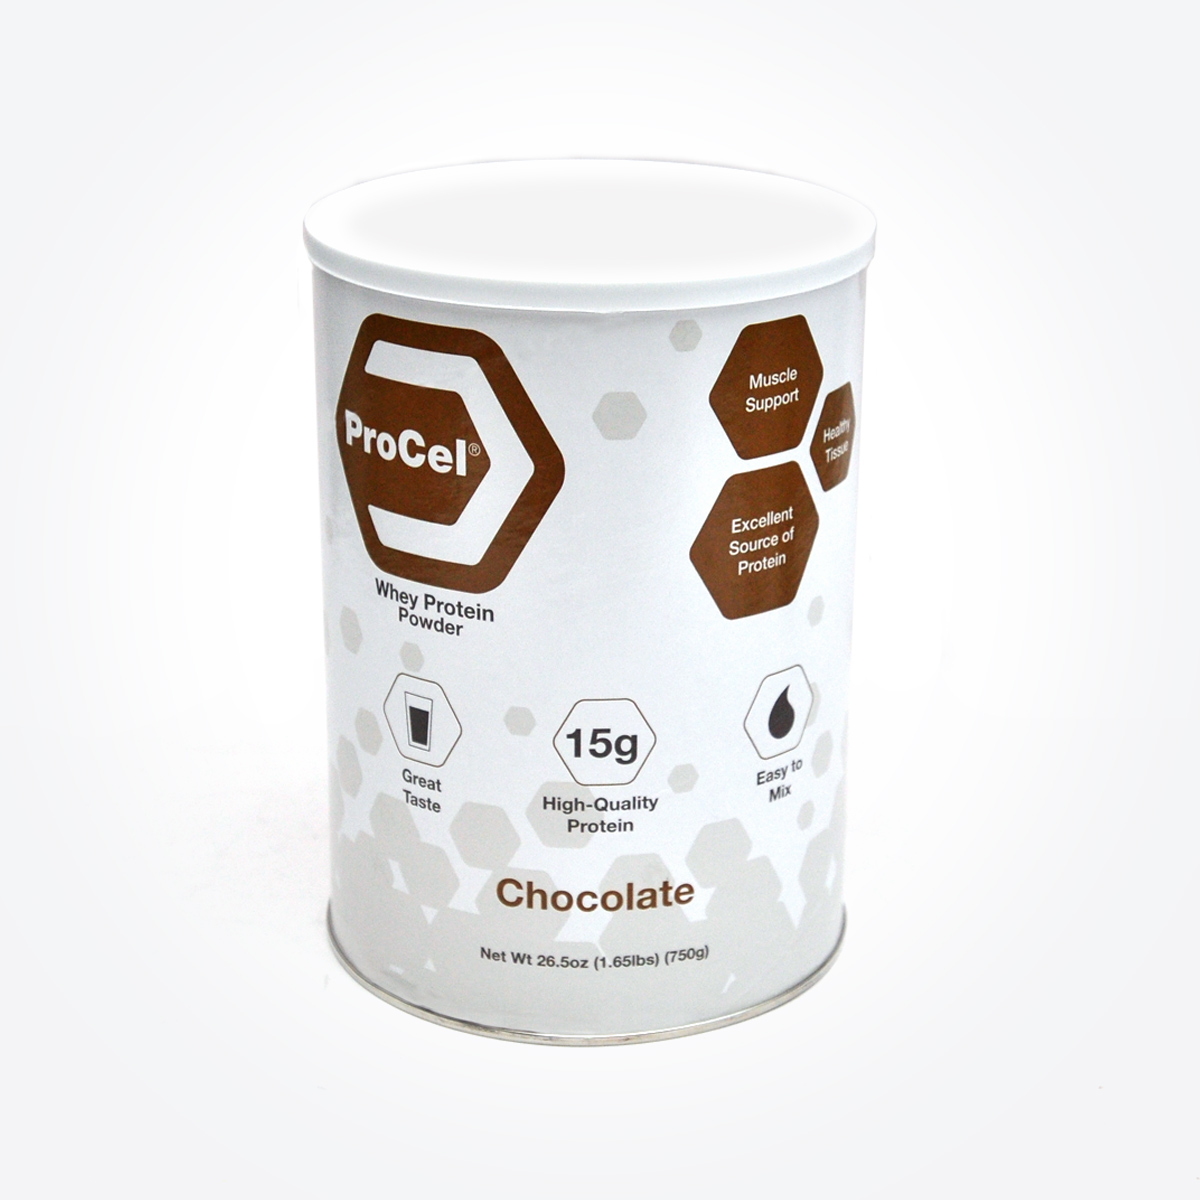 ProCel Chocolate Whey Protein